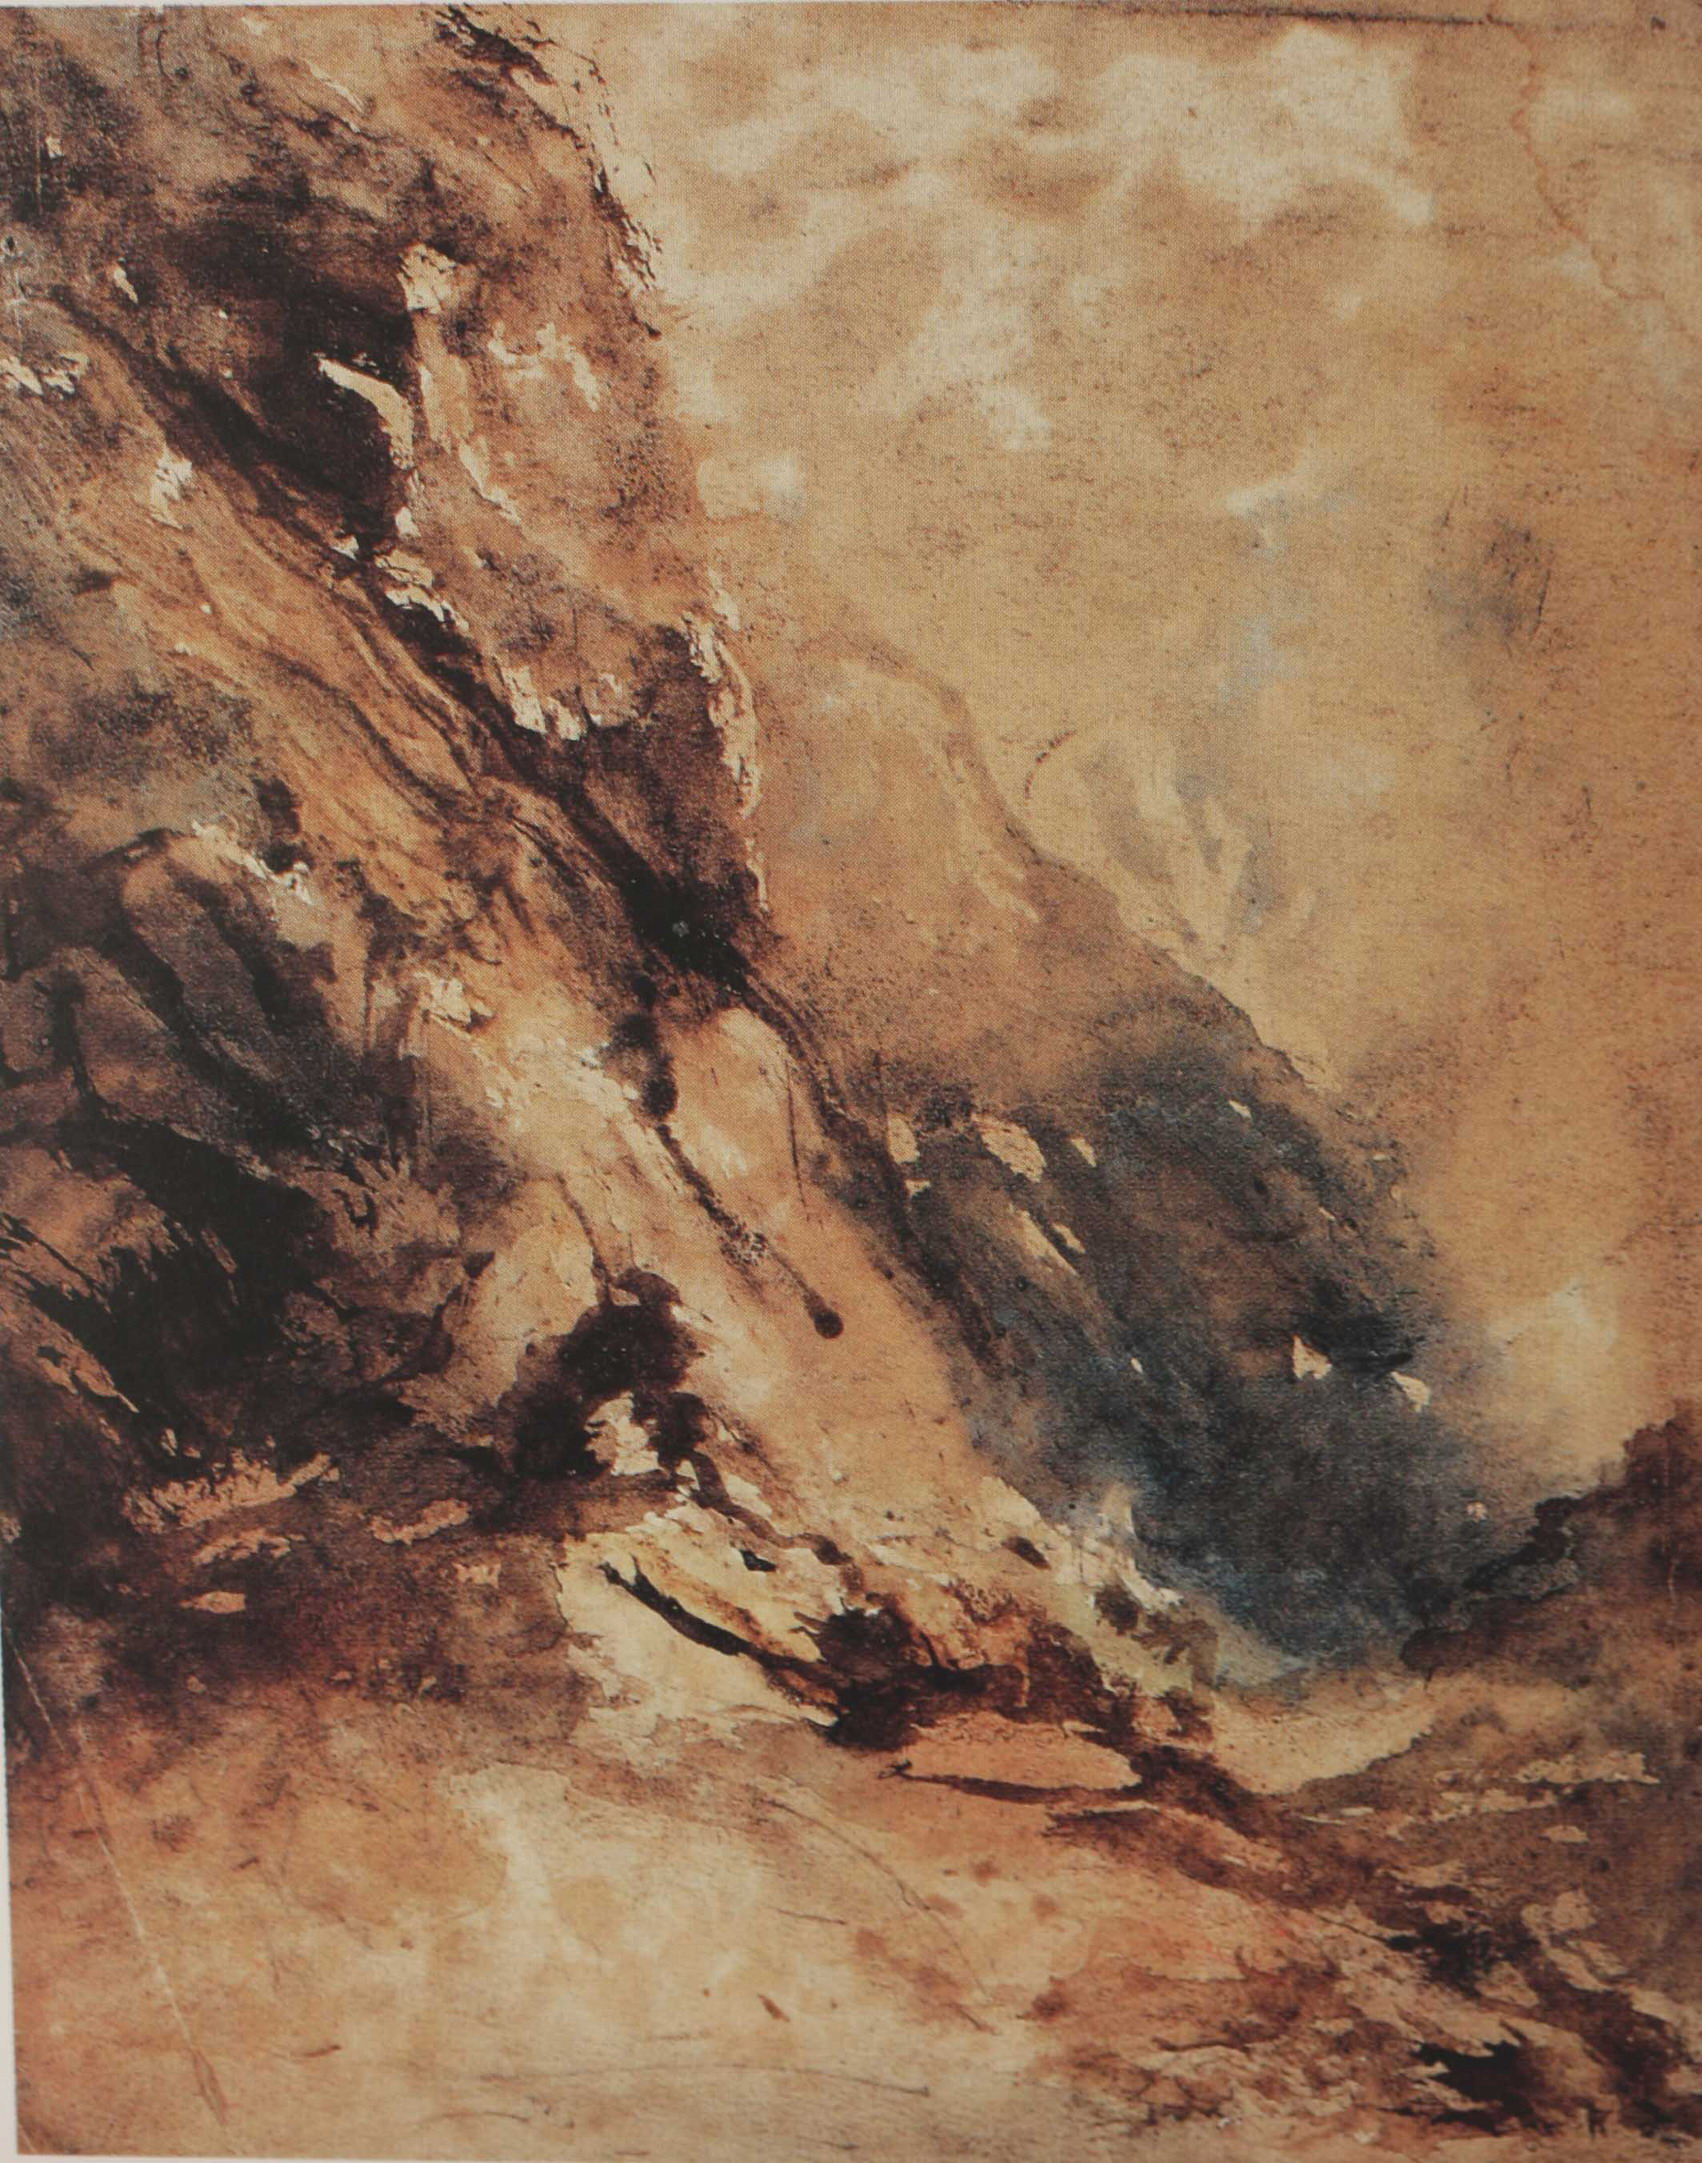 Paisaje, Eugenio Lucas Velázquez